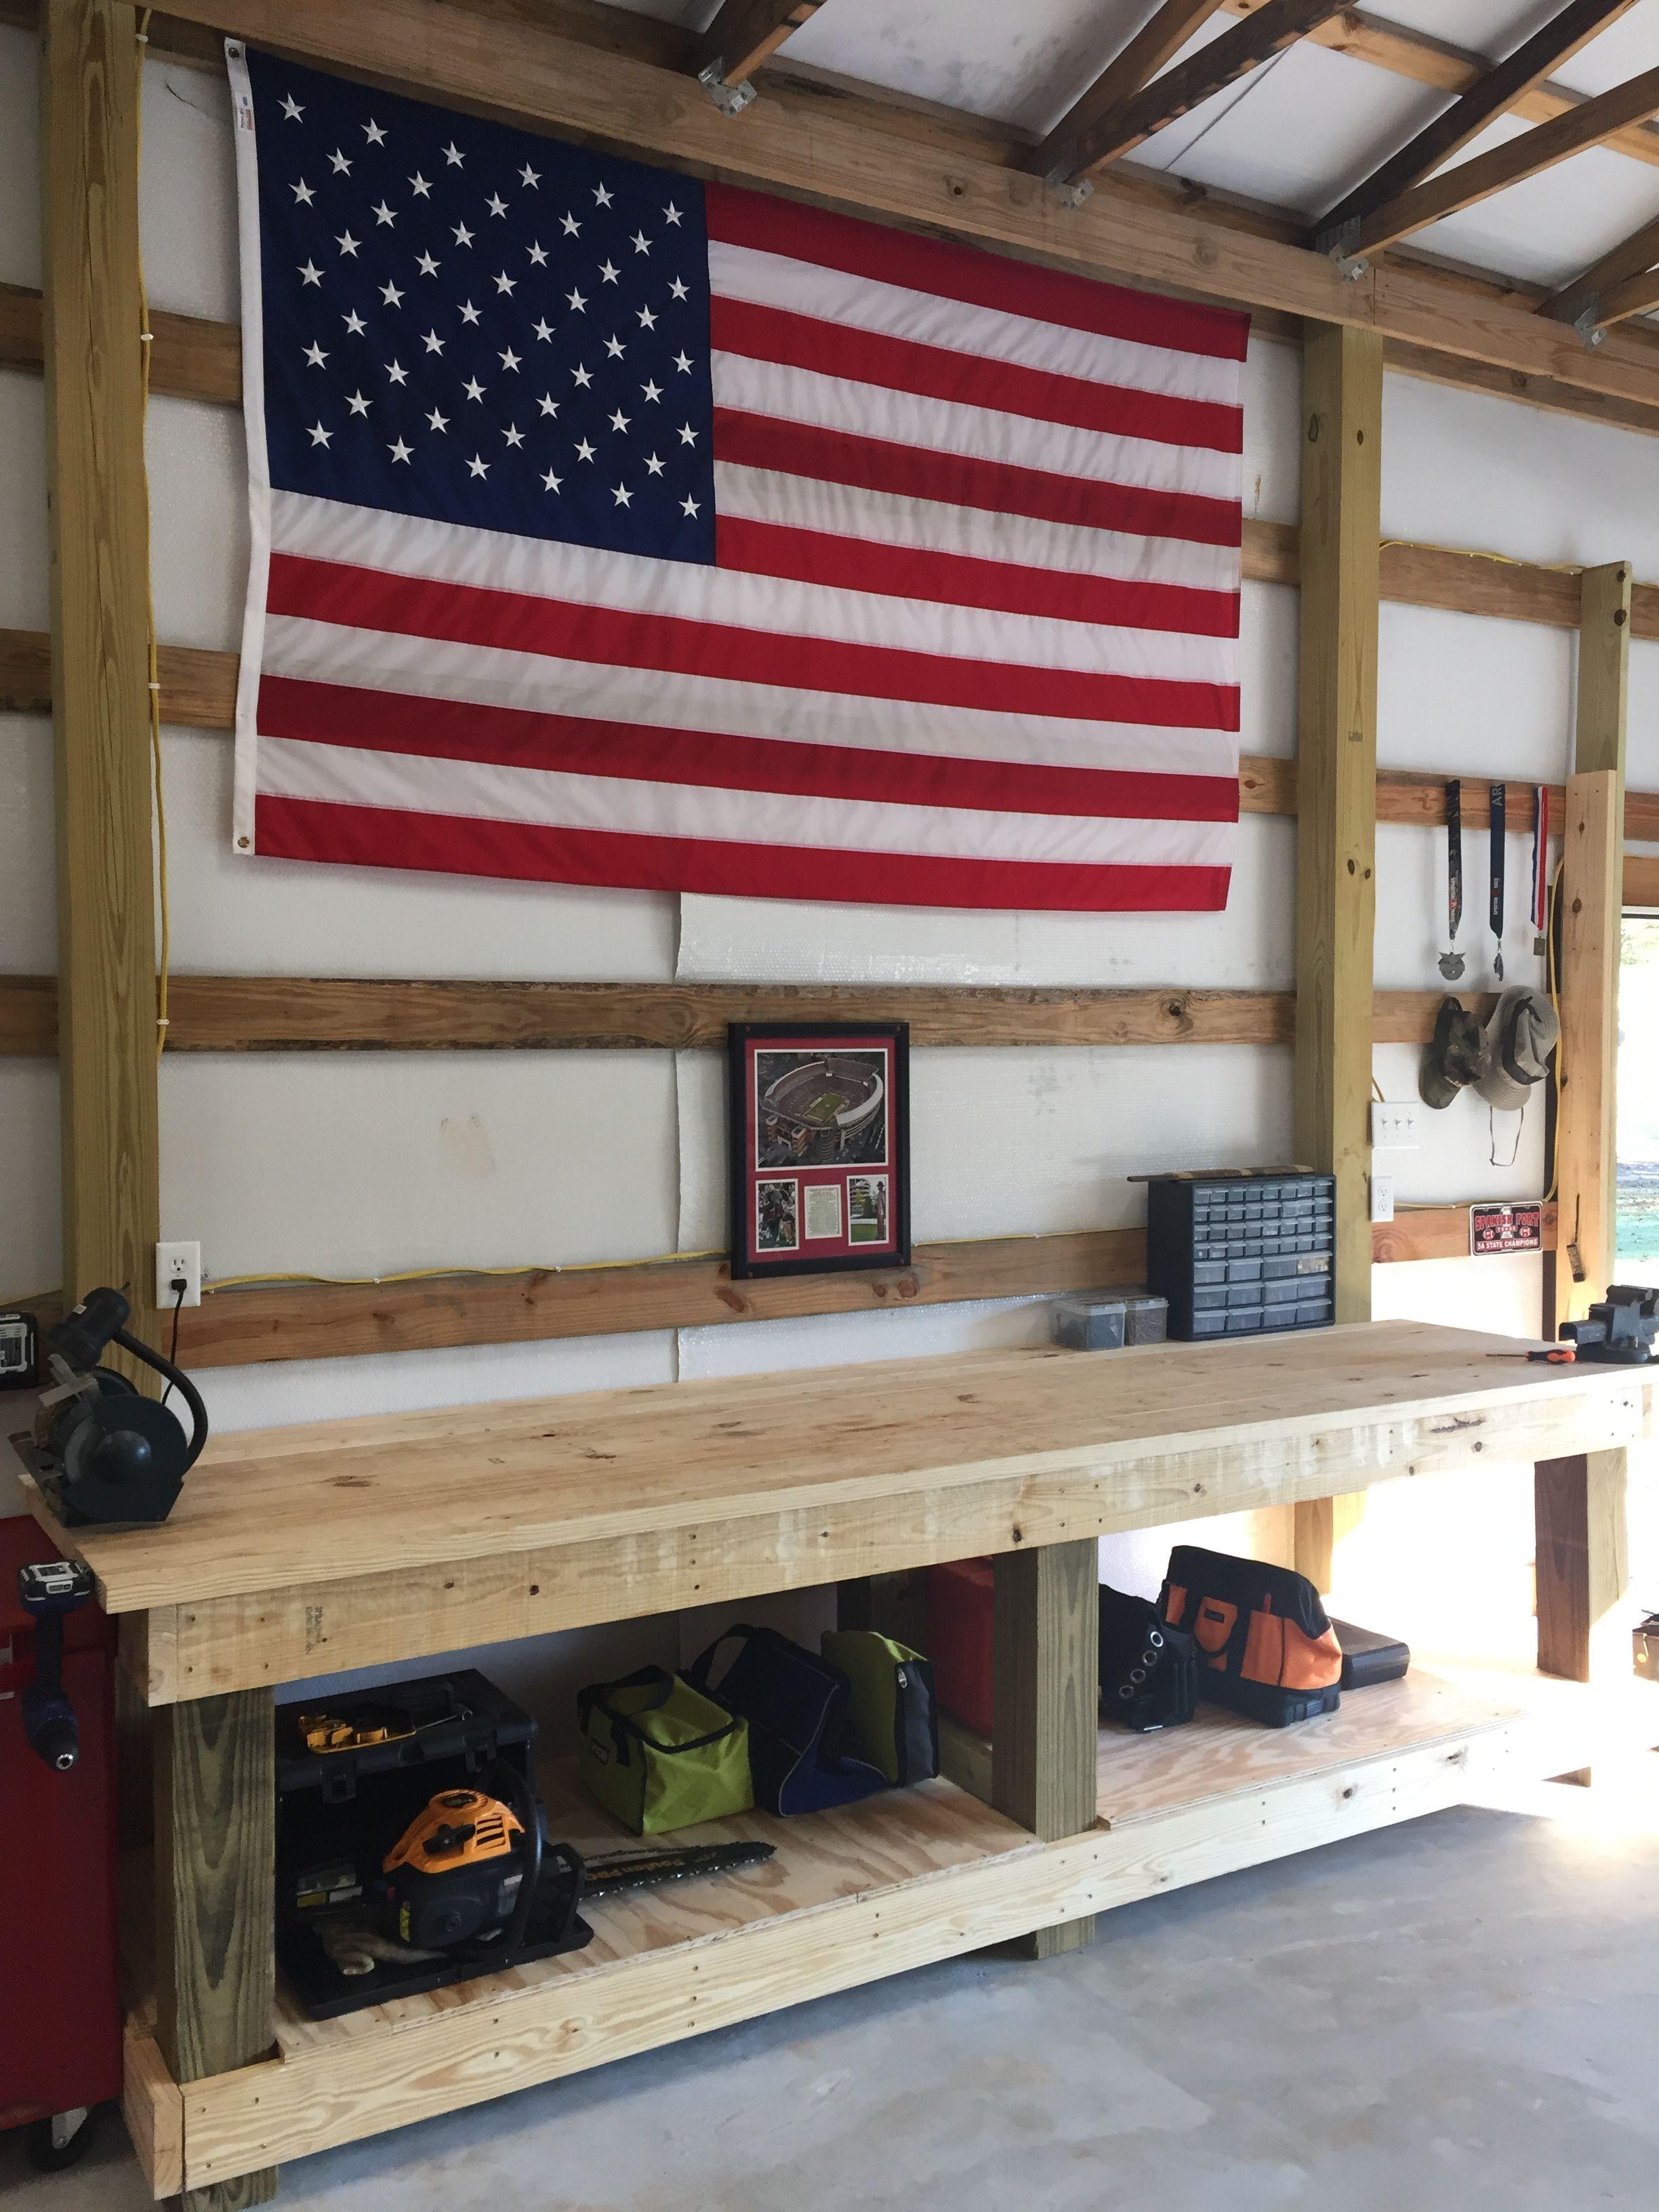 Pole Barn Shop Interior Ideas : interior, ideas, Poles, Bench., Barn,, Workbench